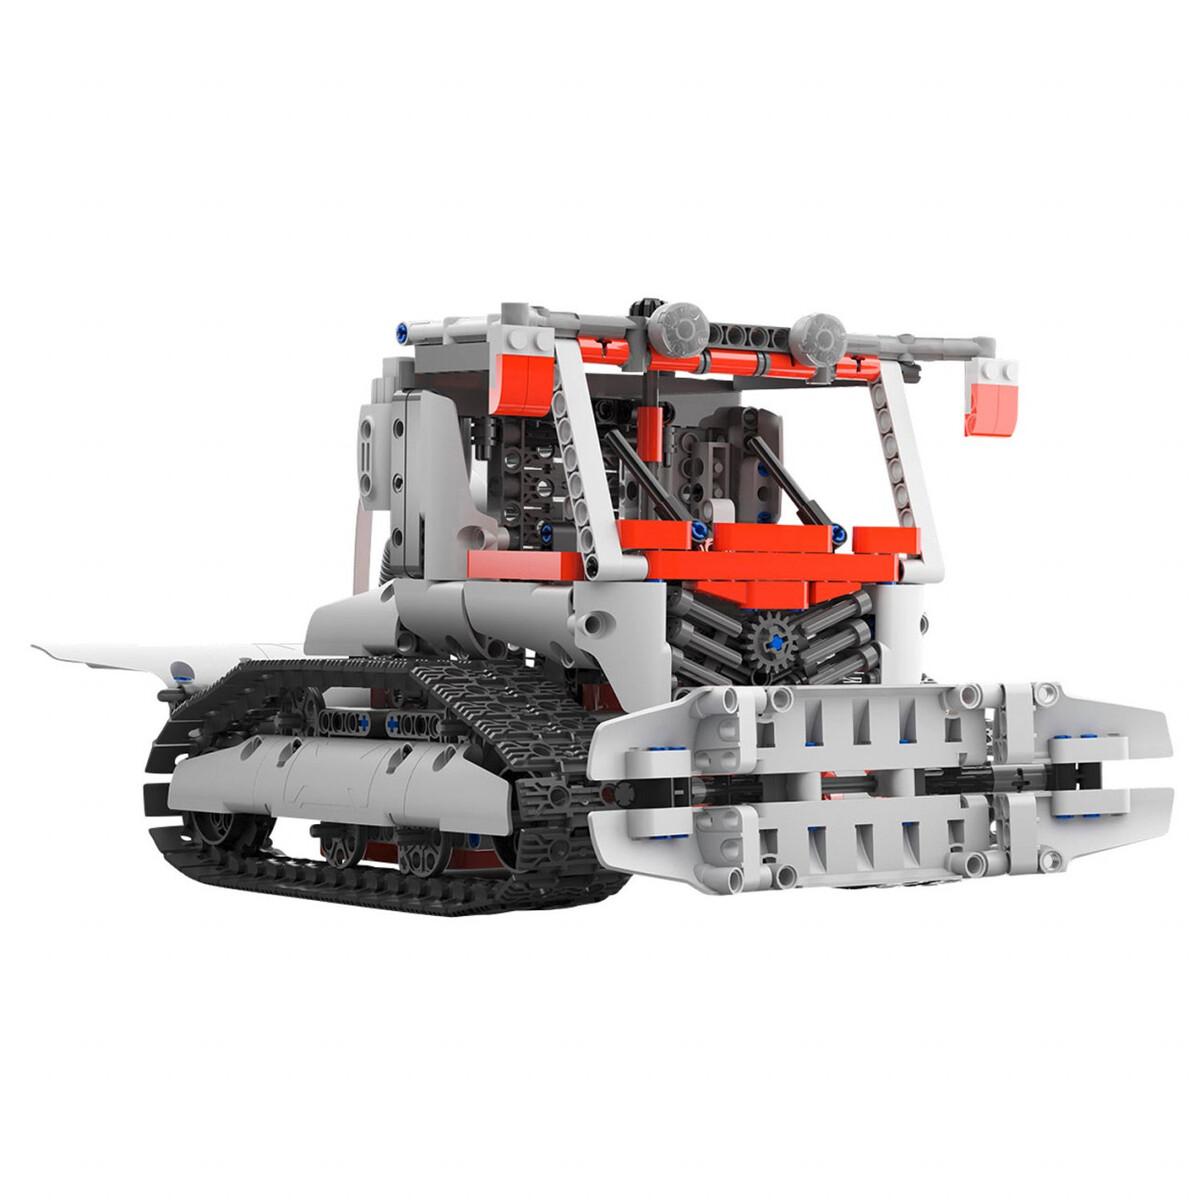 Bild 3 von Appgesteuerter Roboter Mi Robot Builder Rover